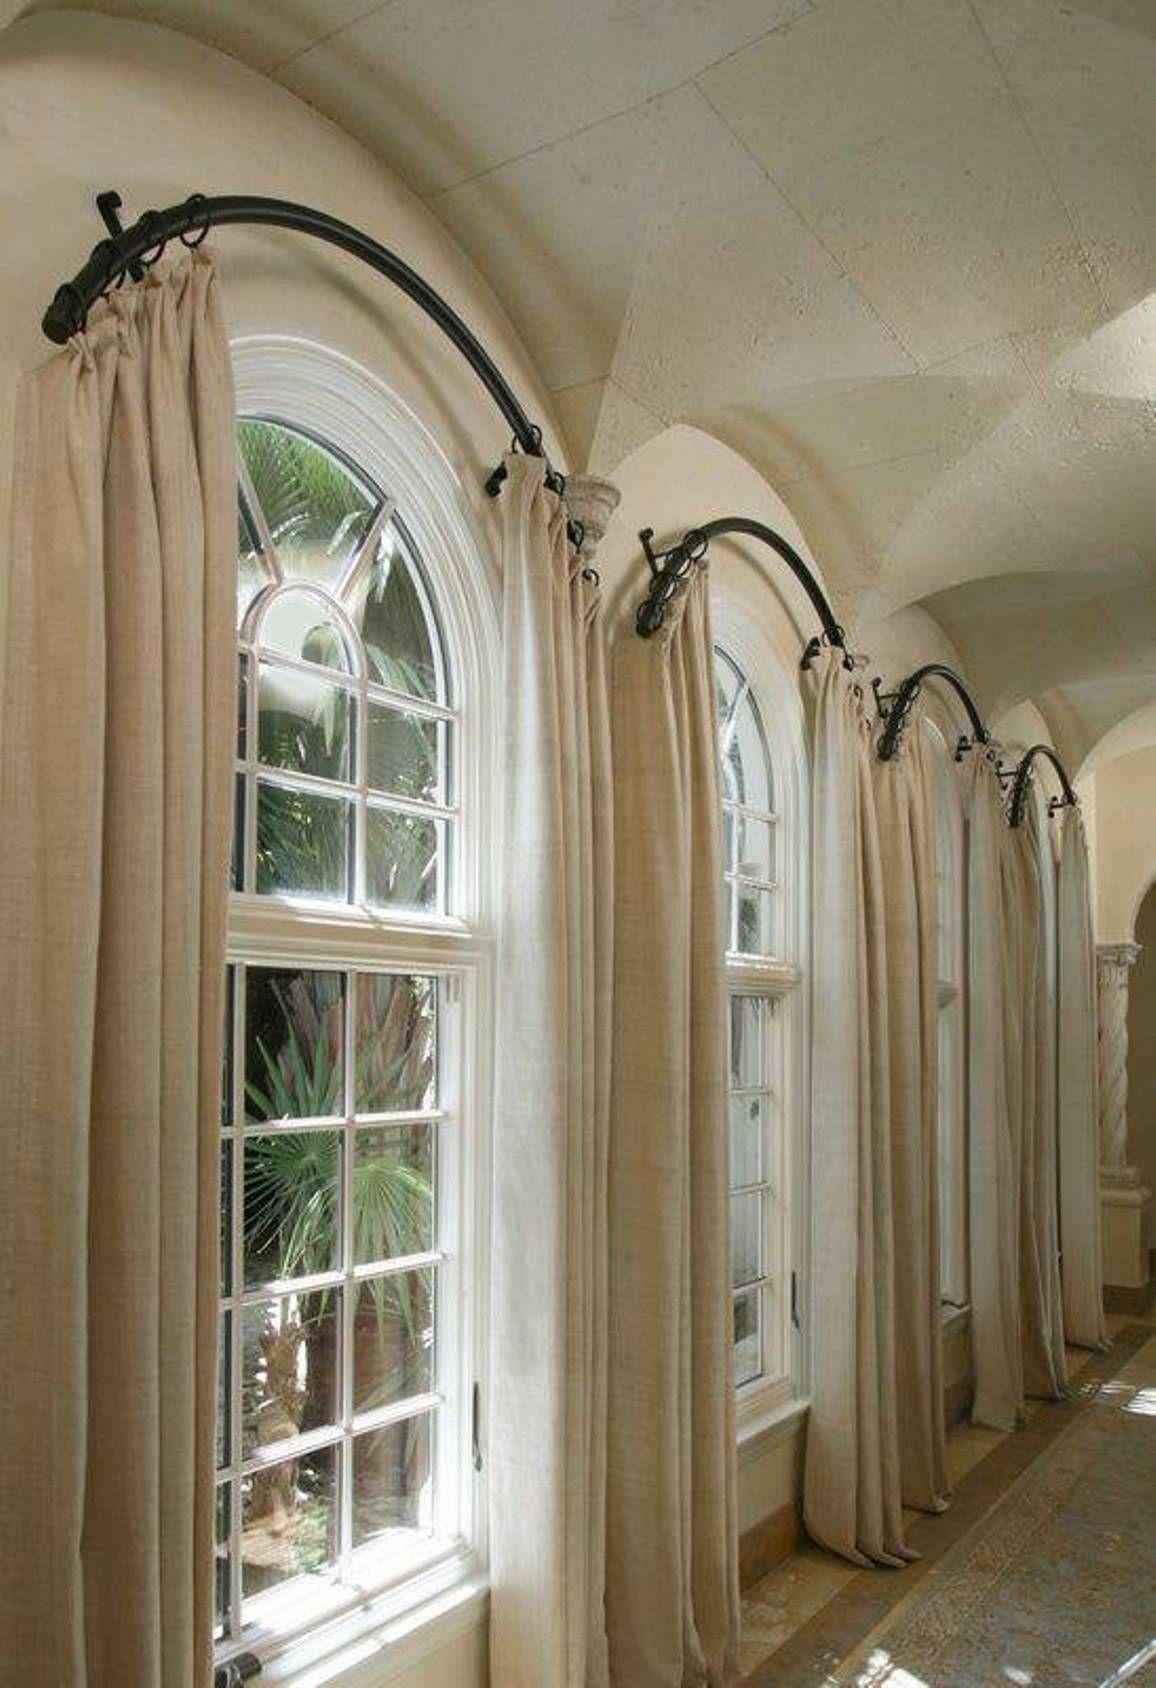 Curtains Over Half Moon Window Windows in 2019